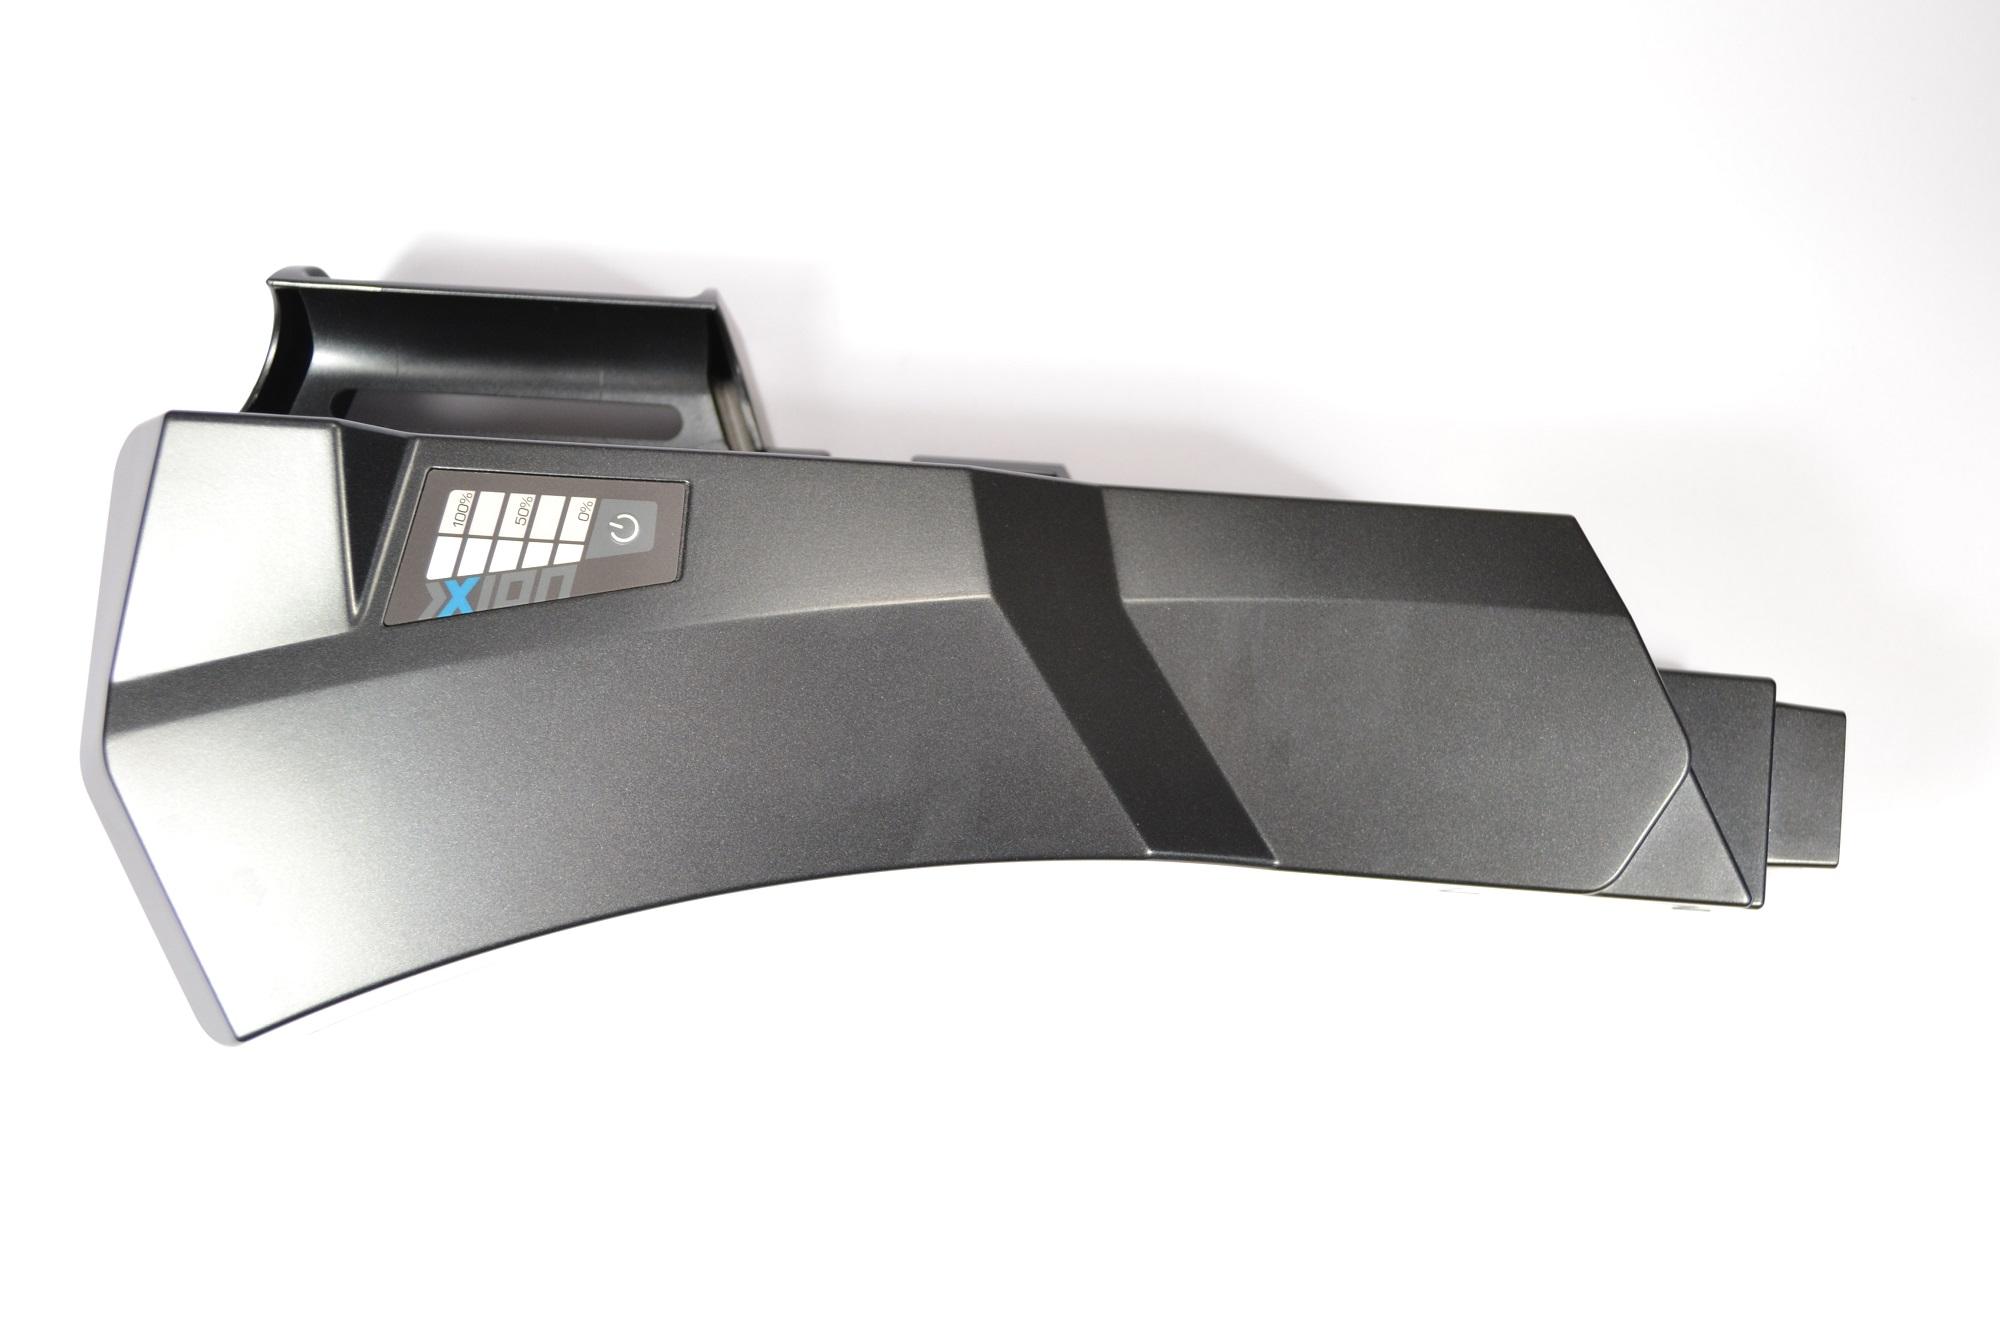 e bike xion akku 36v 14 5ah seattube original derby cycle. Black Bedroom Furniture Sets. Home Design Ideas